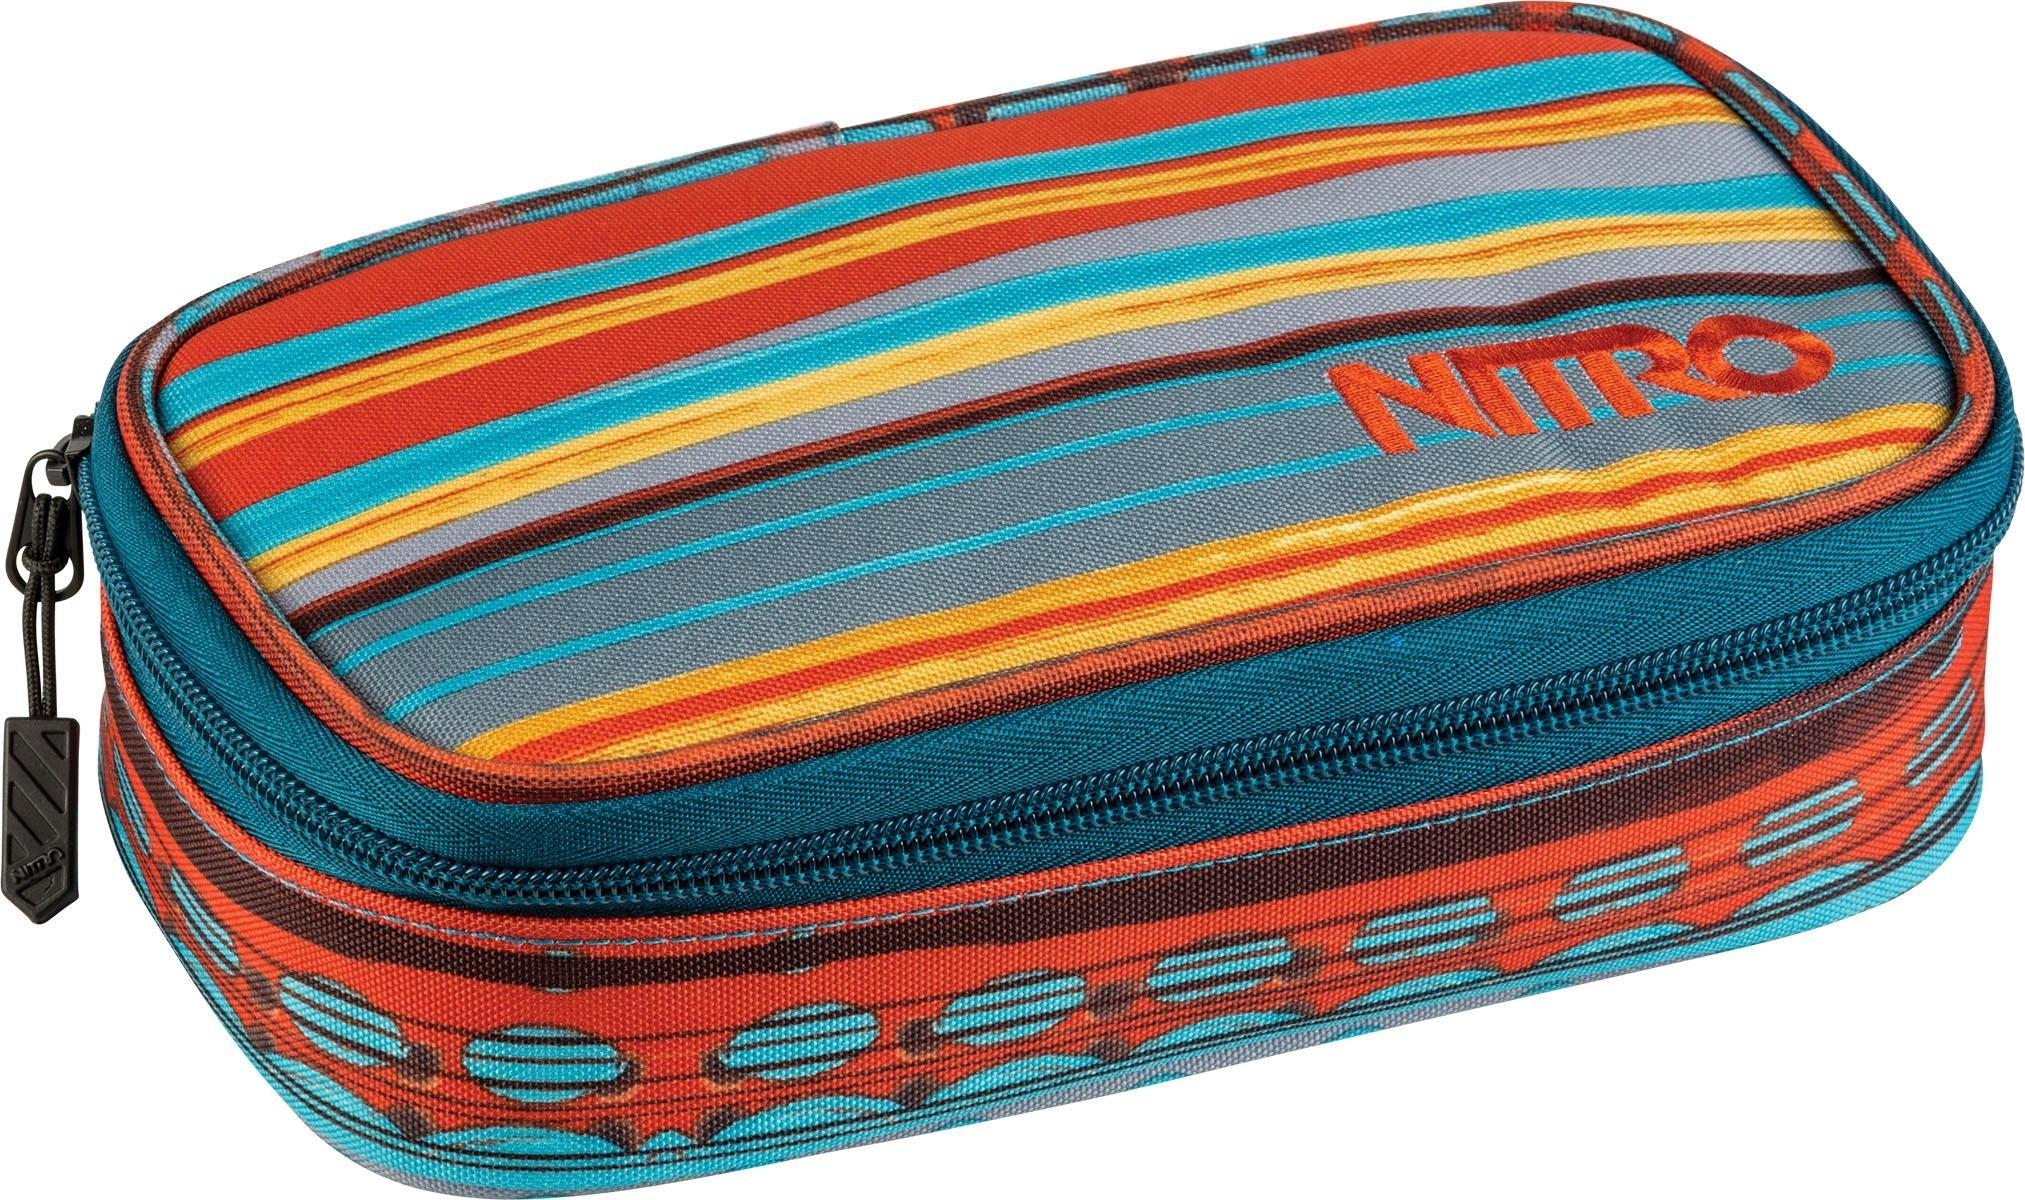 NITRO etui, »Pencil Case XL Canyon« bestellen: 30 dagen bedenktijd